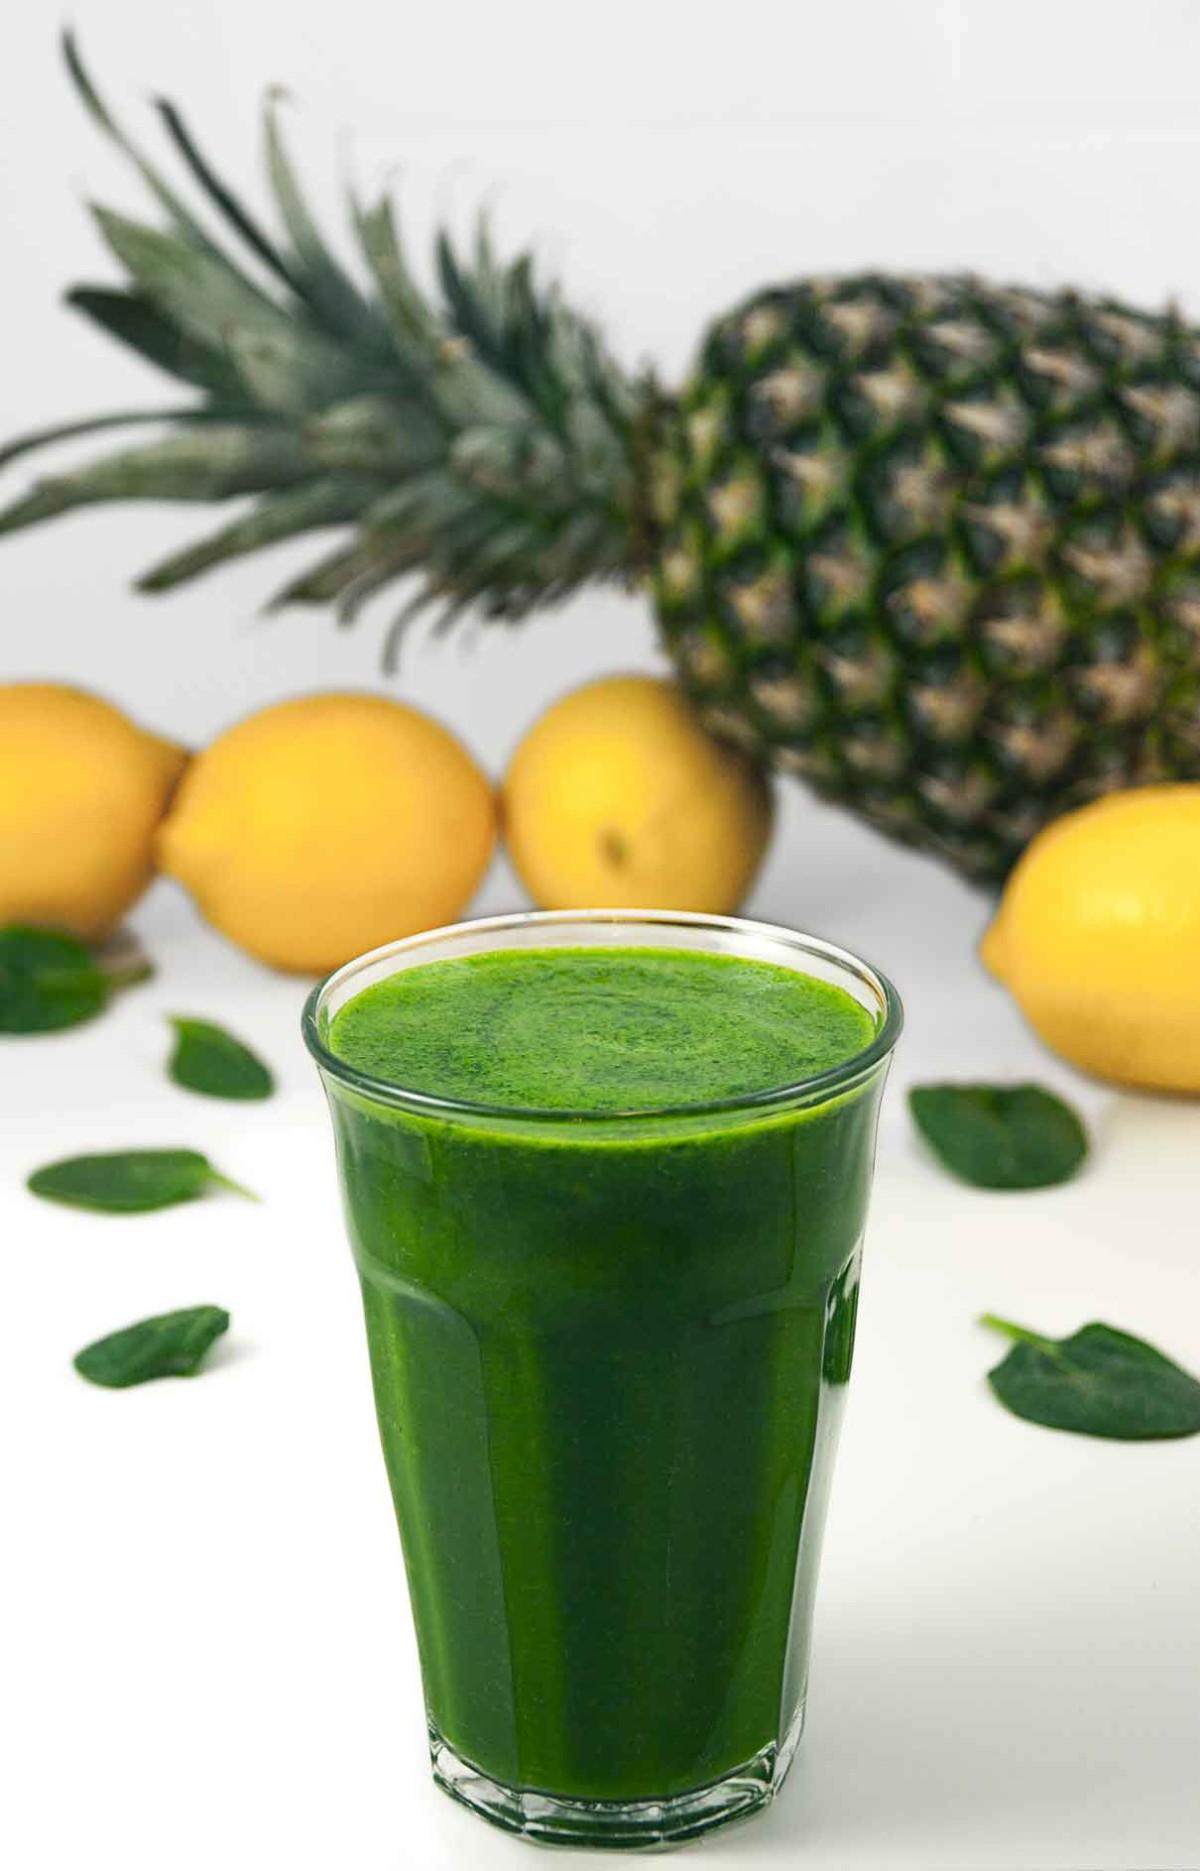 Spinach Pineapple Apple Lemon Juice Share Love Not Secrets - Secret benefits drinking apple juice